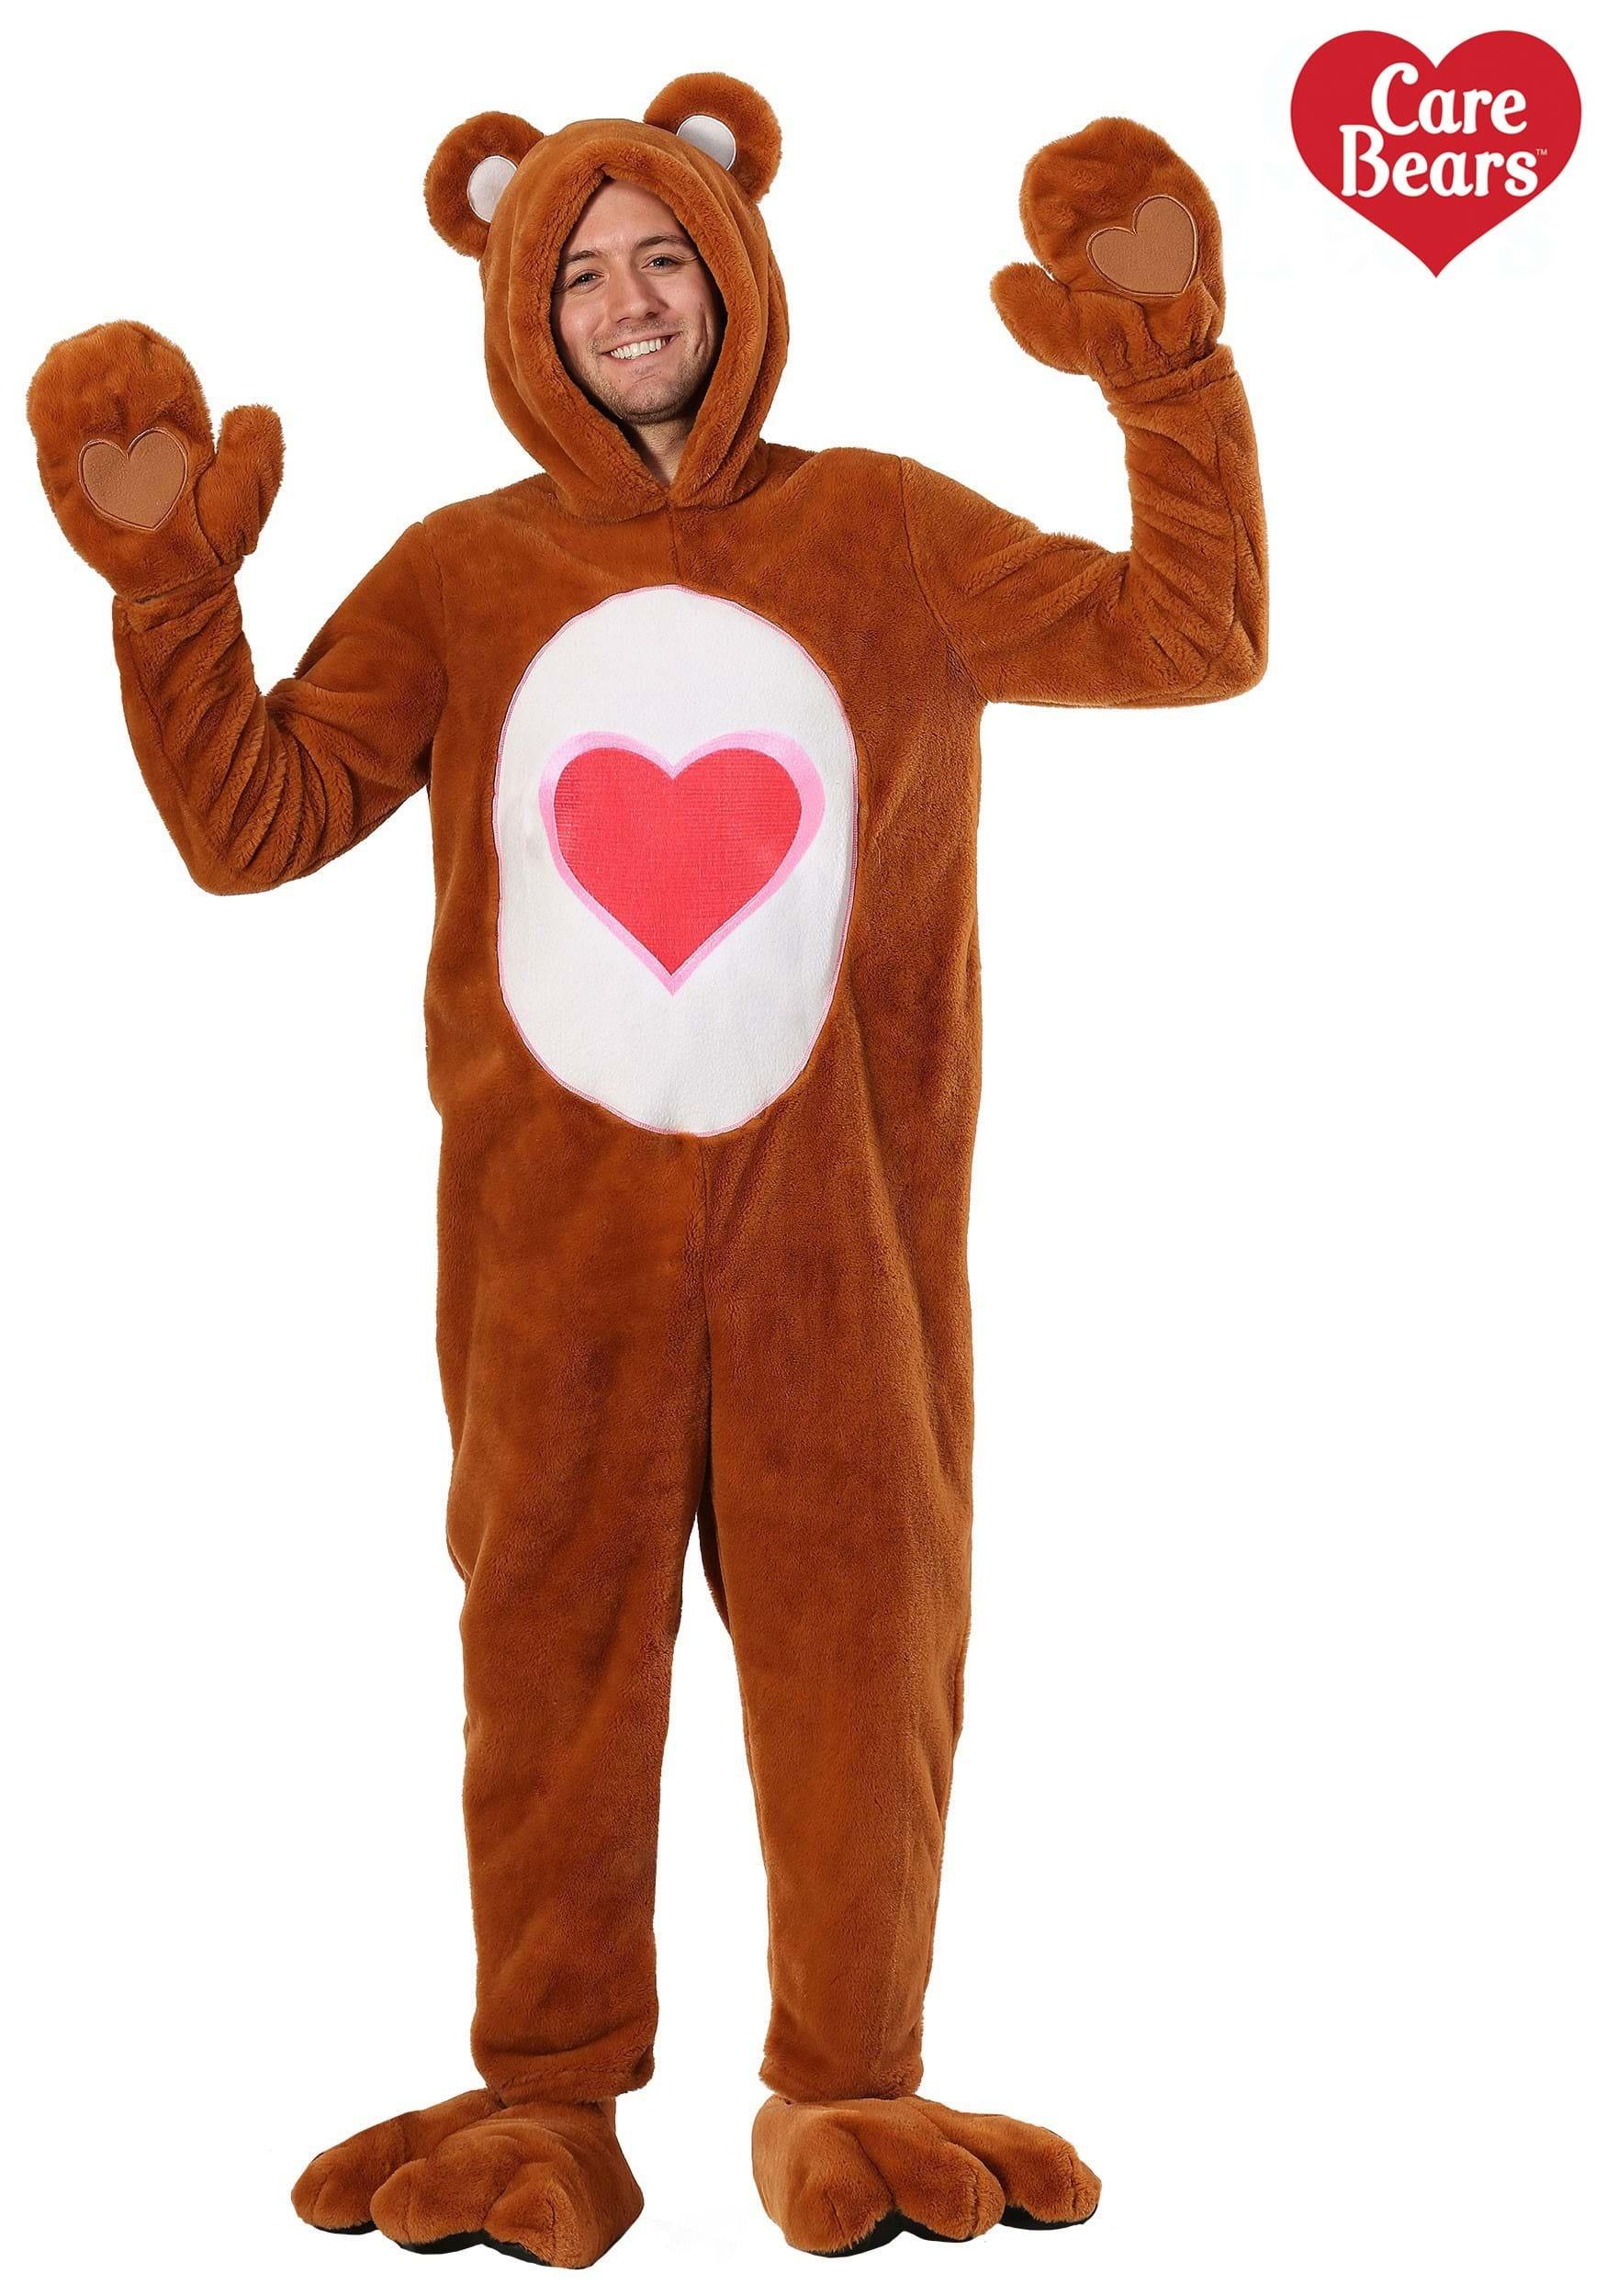 Care Bears Deluxe Tenderheart Bear Costume For Adults